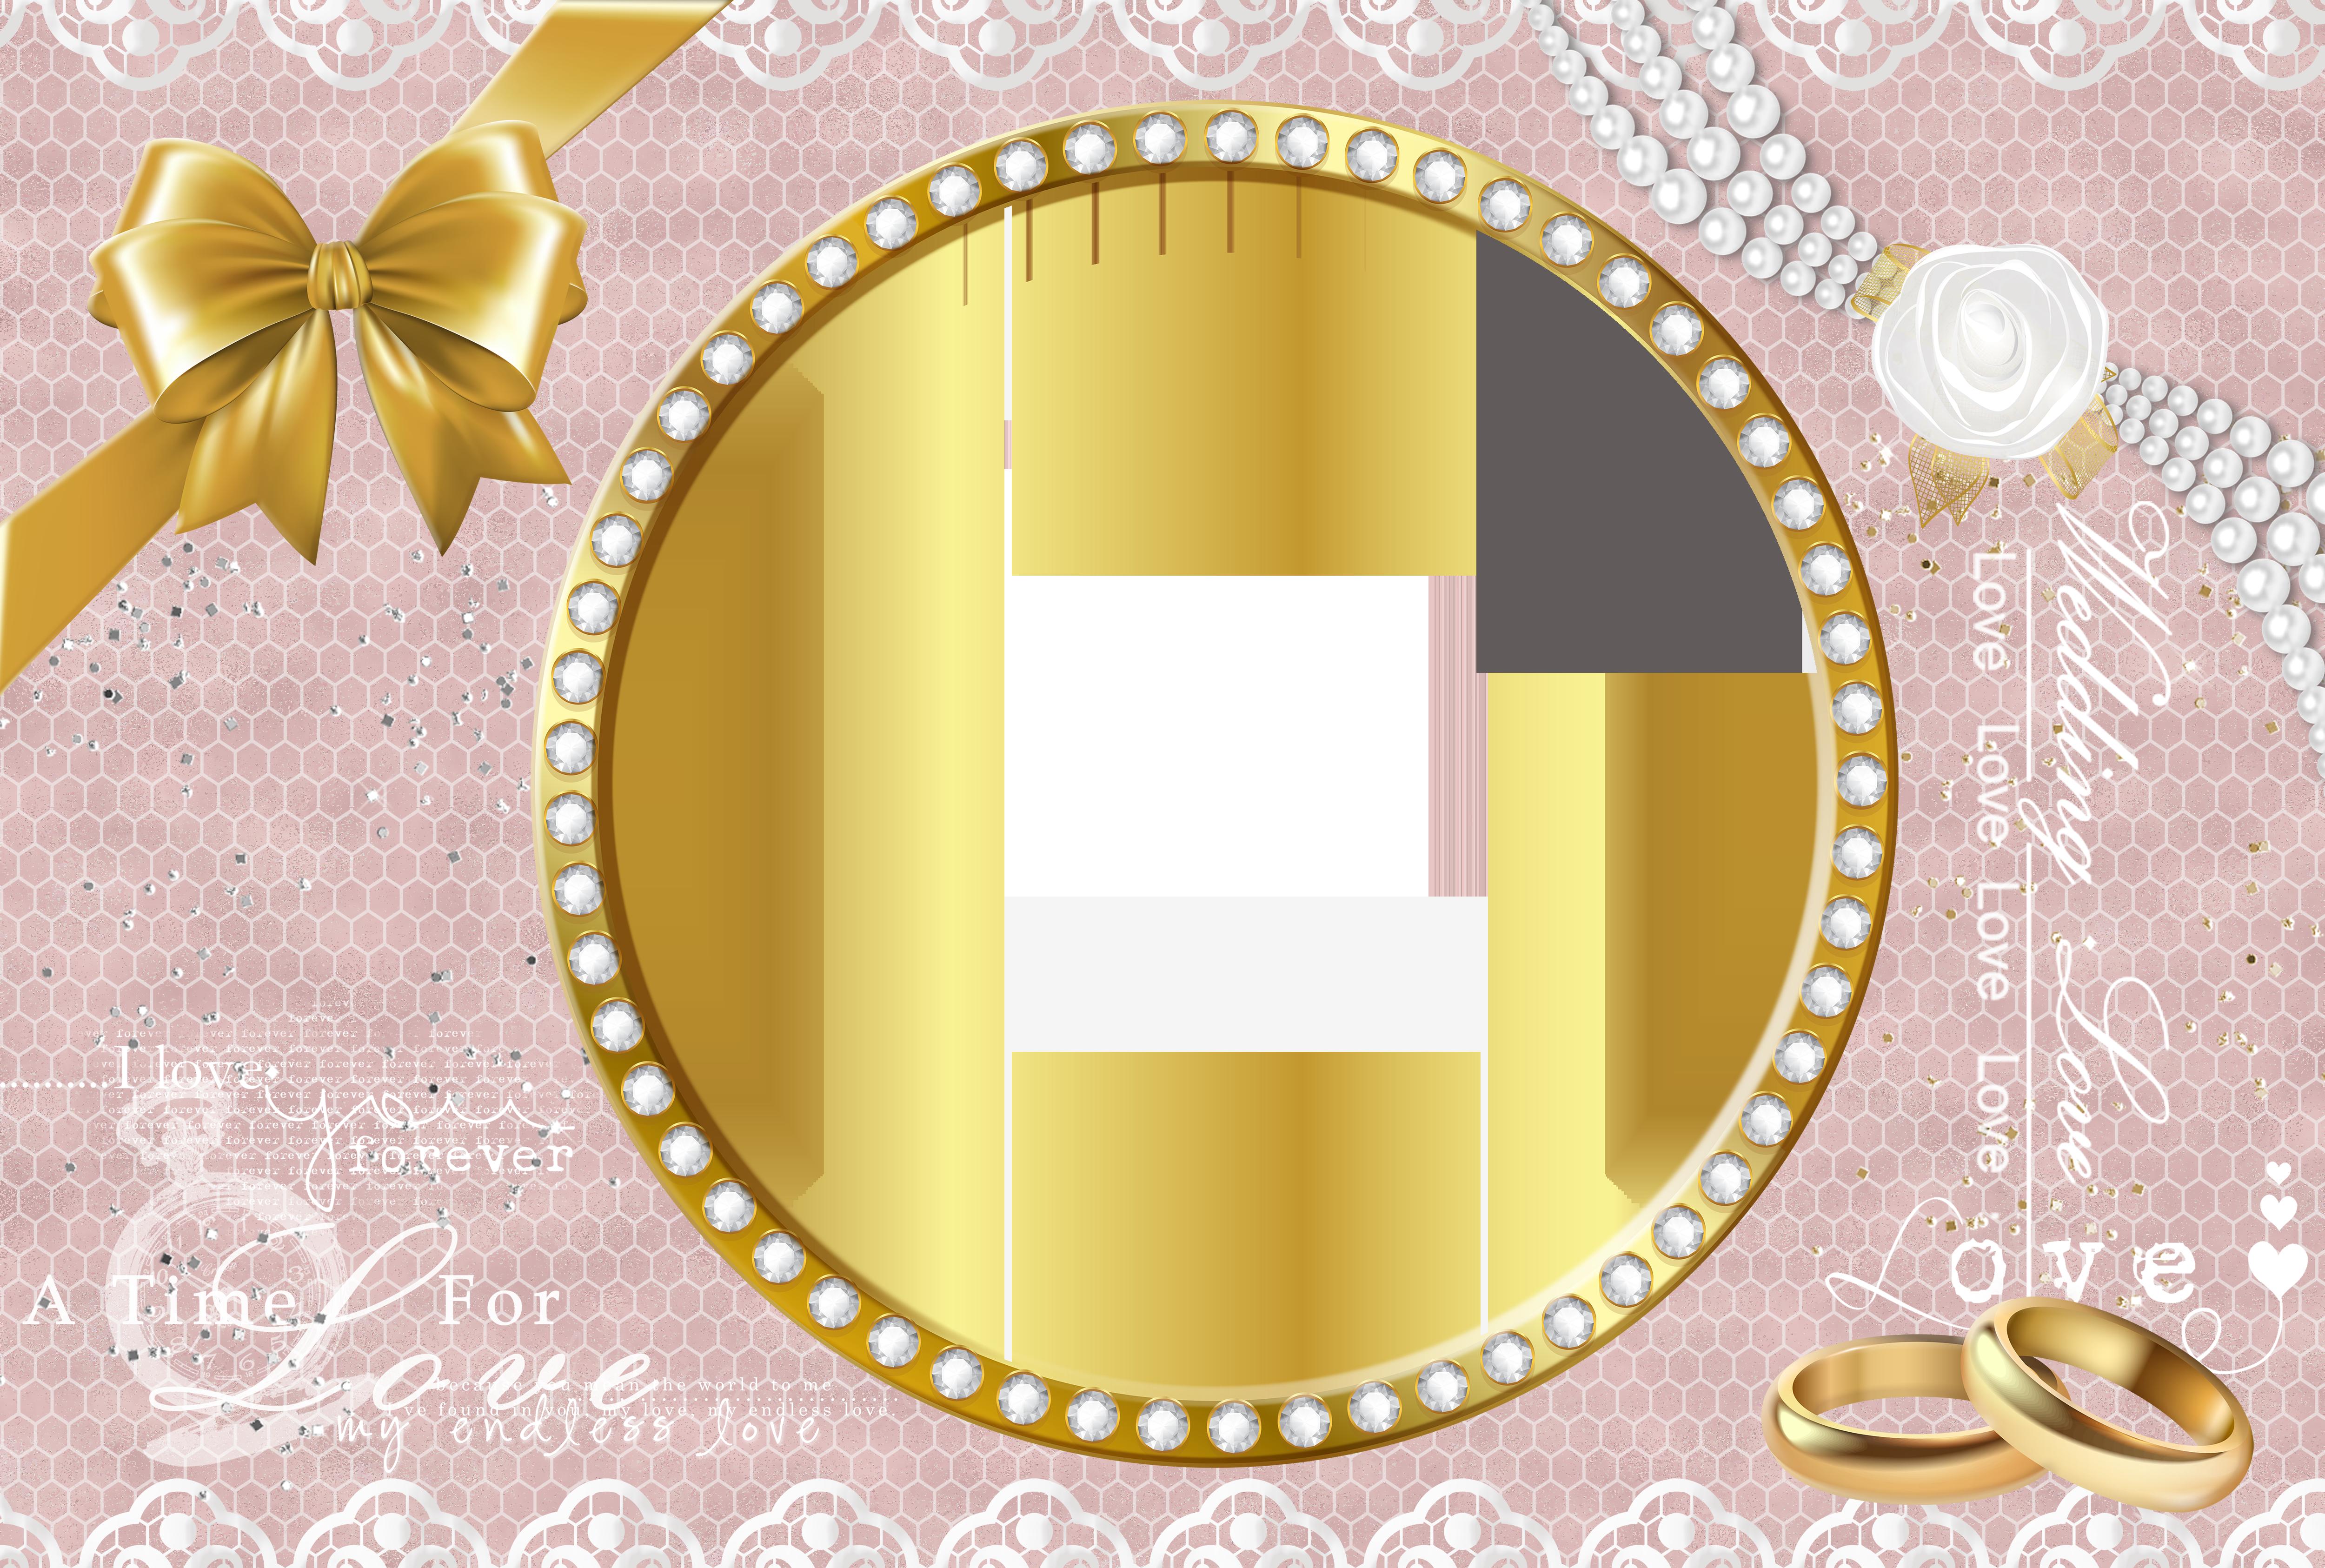 Frame transparent png image. Clipart wedding circle